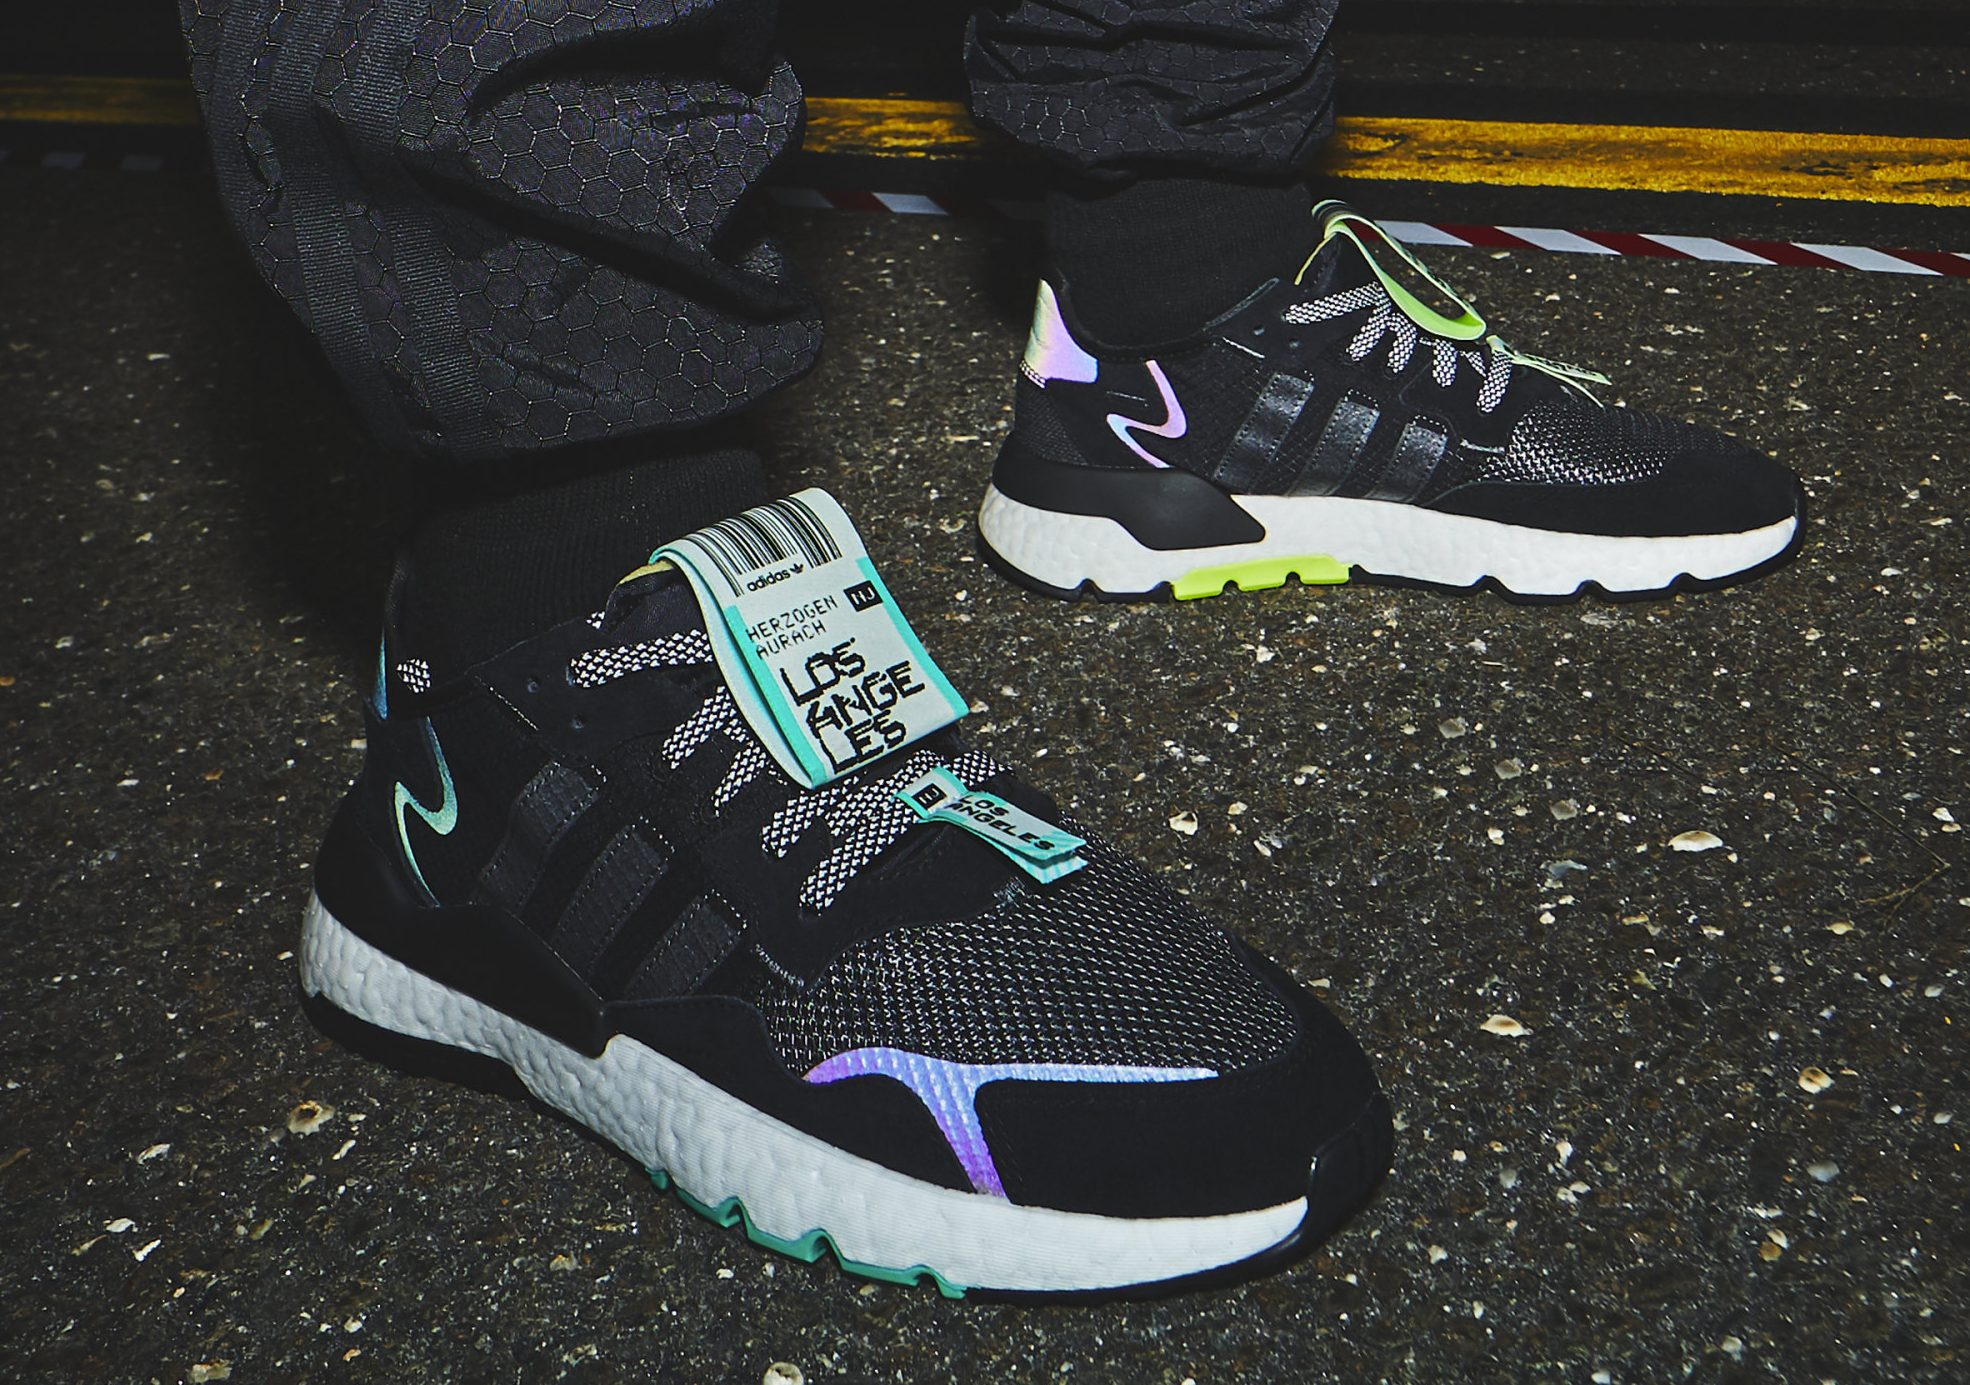 Adidas Nite Jogger 'Jet Set' Release